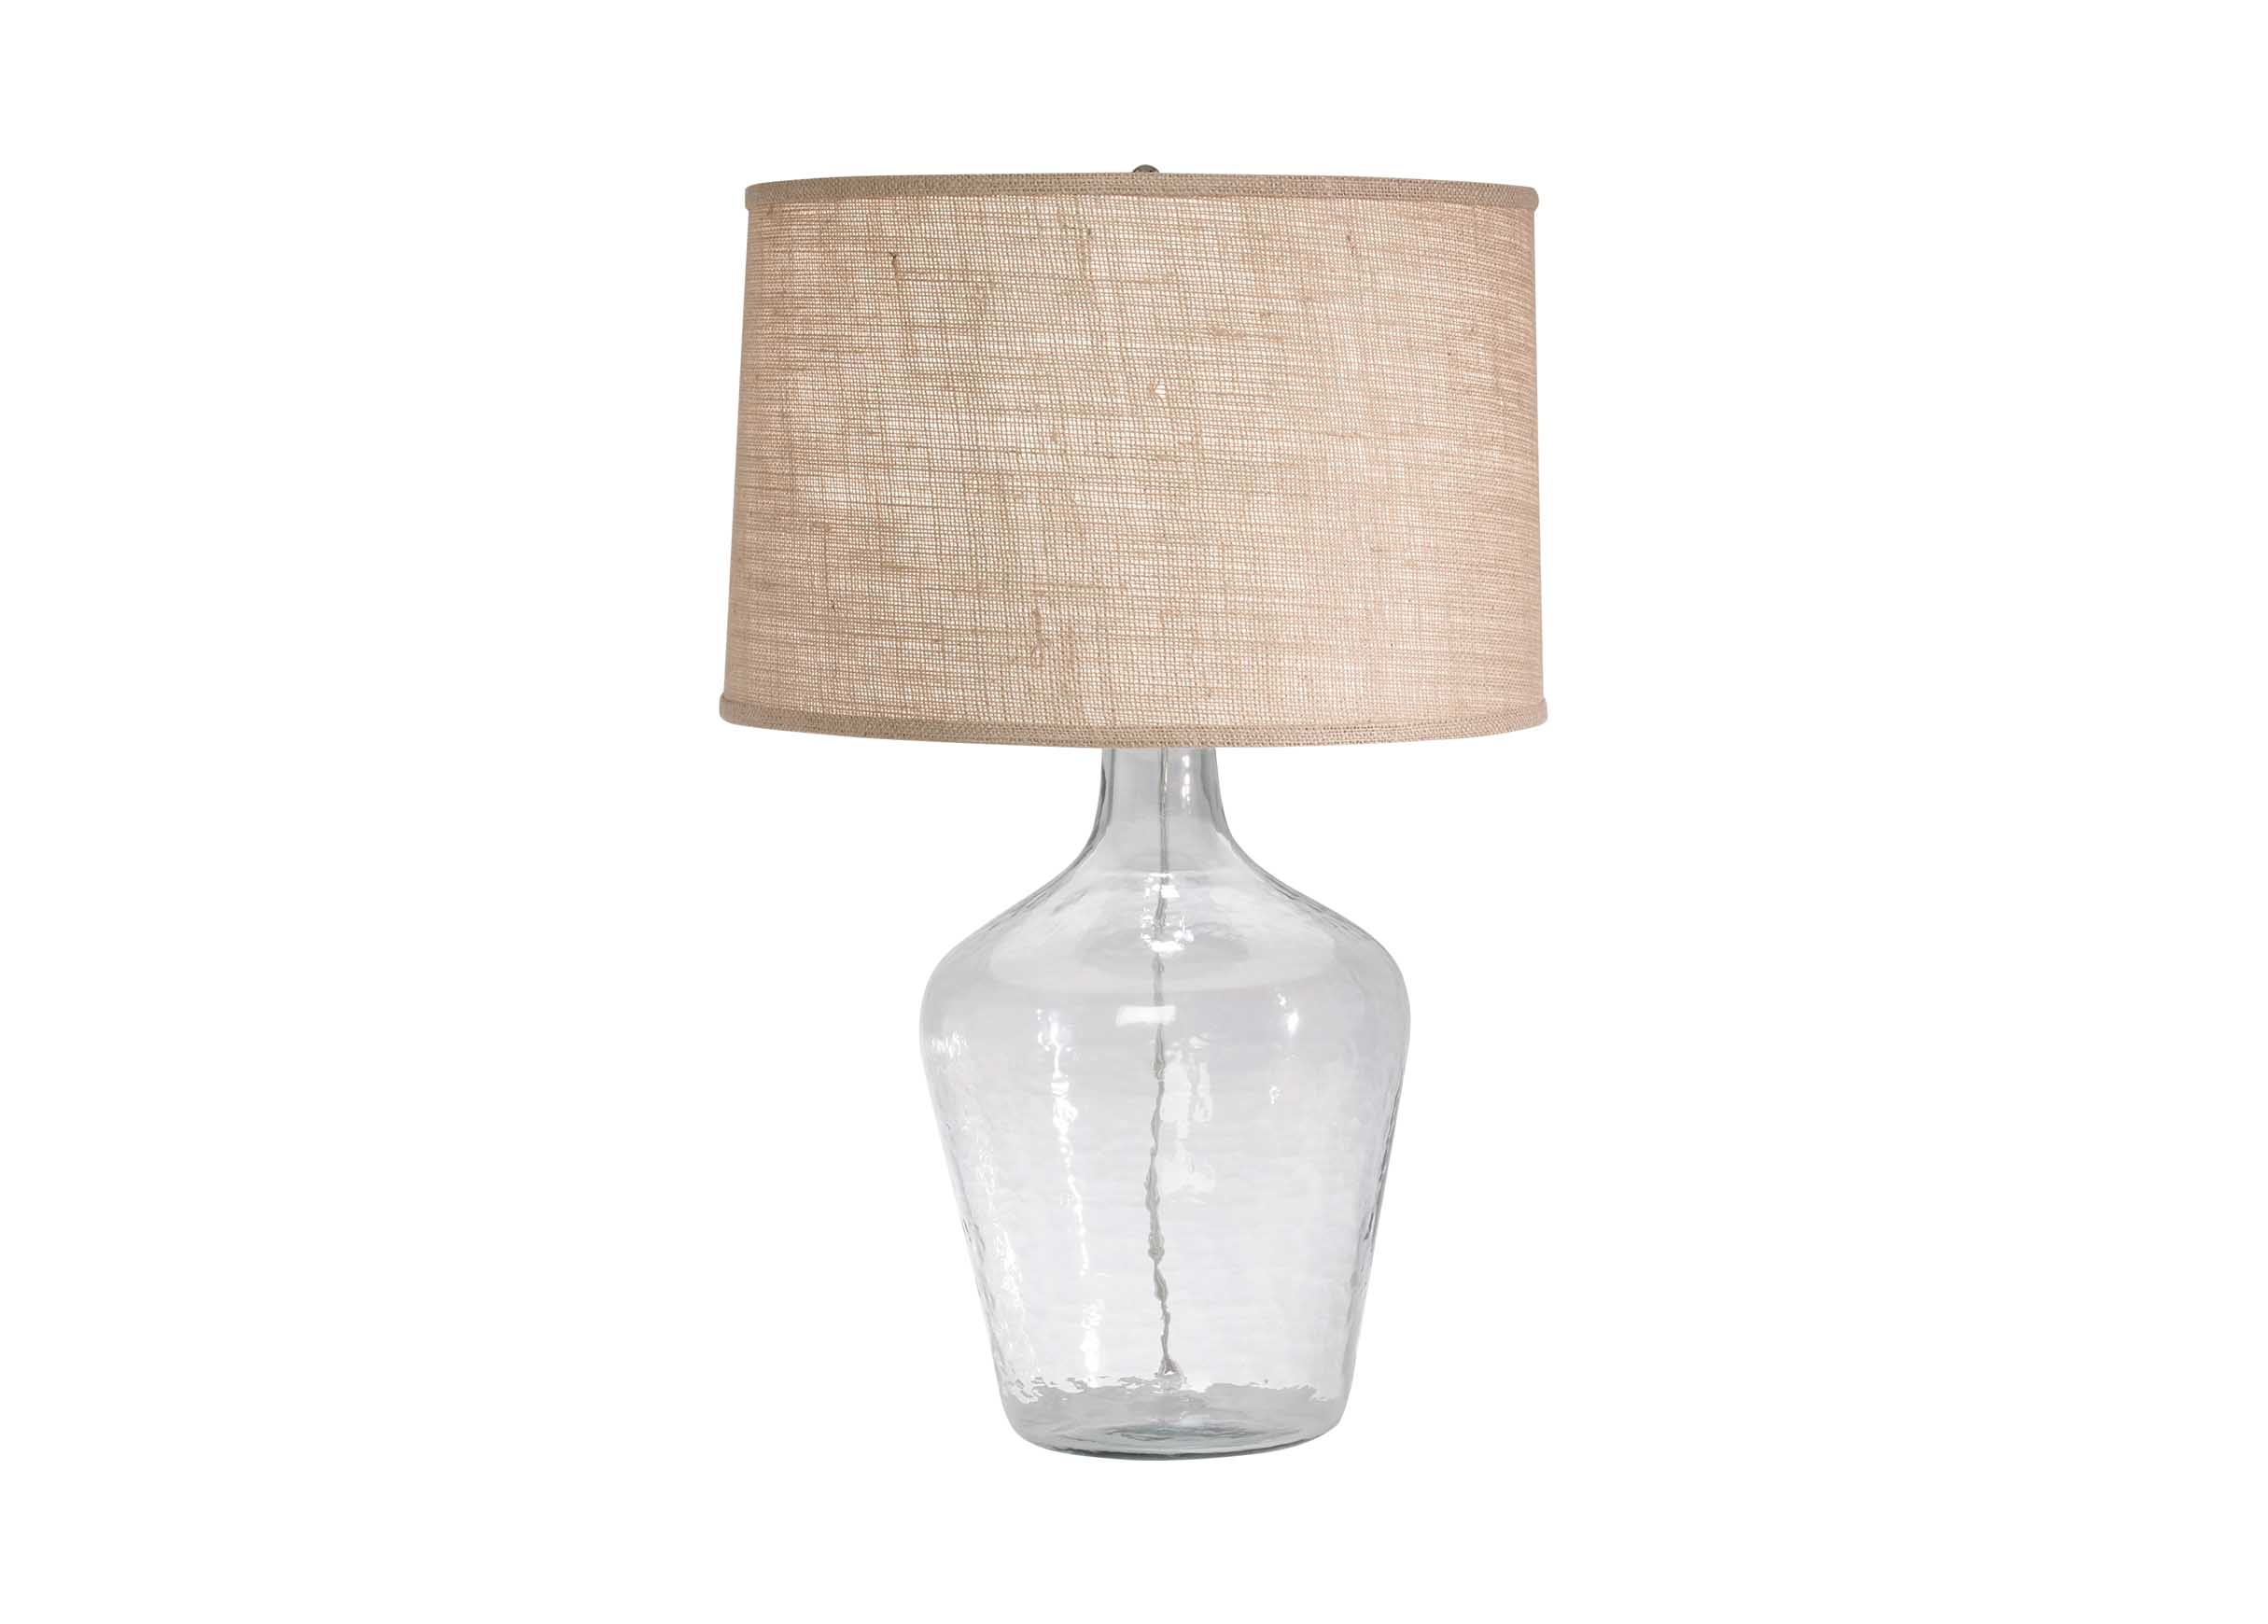 Glass Plum Jar Table Lamp